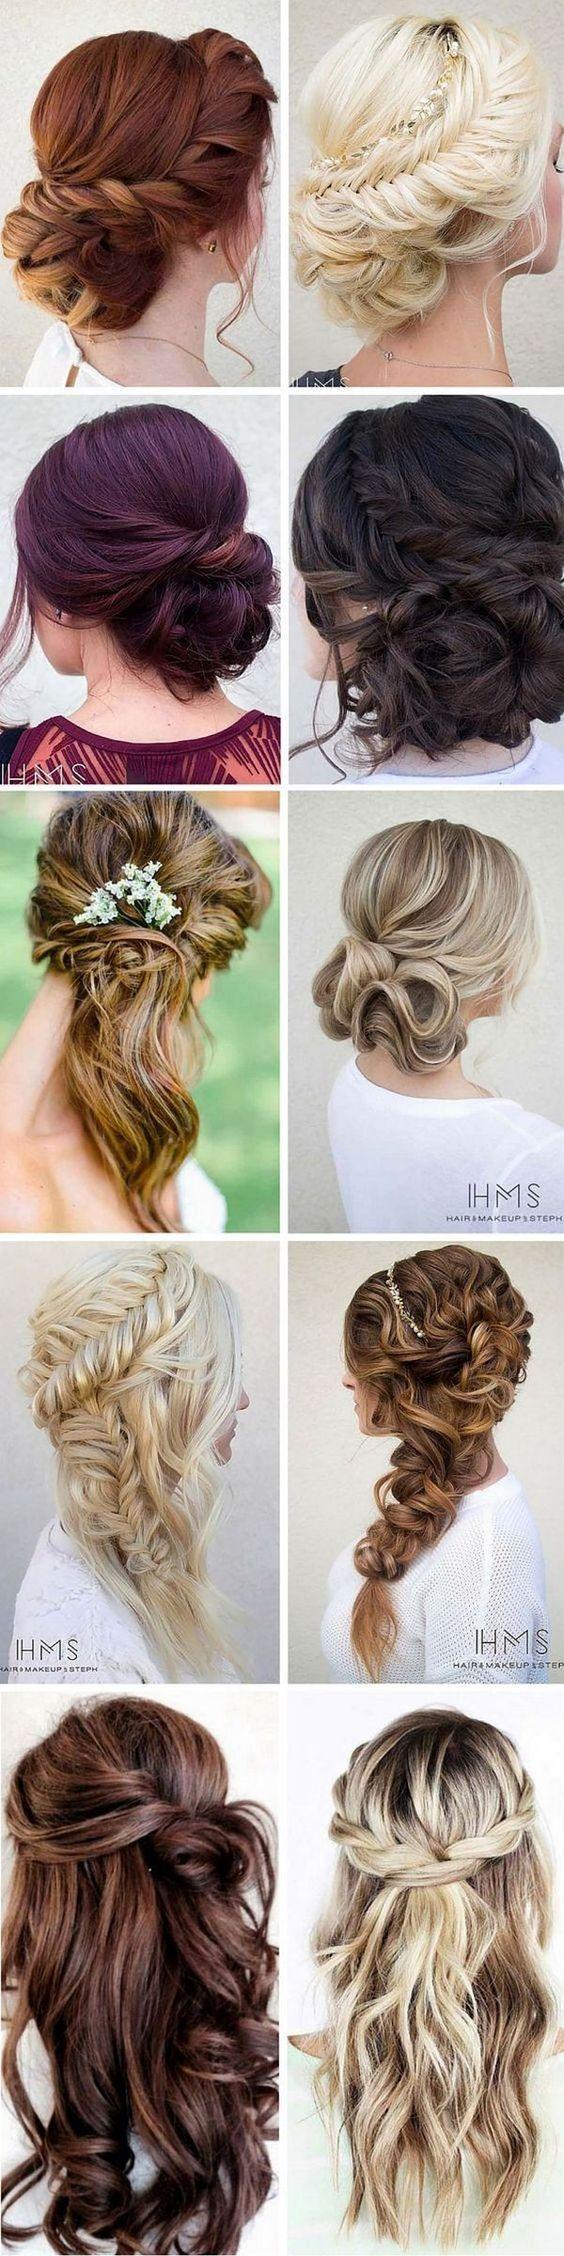 Lindas bohemian style pinterest hair style makeup and hair